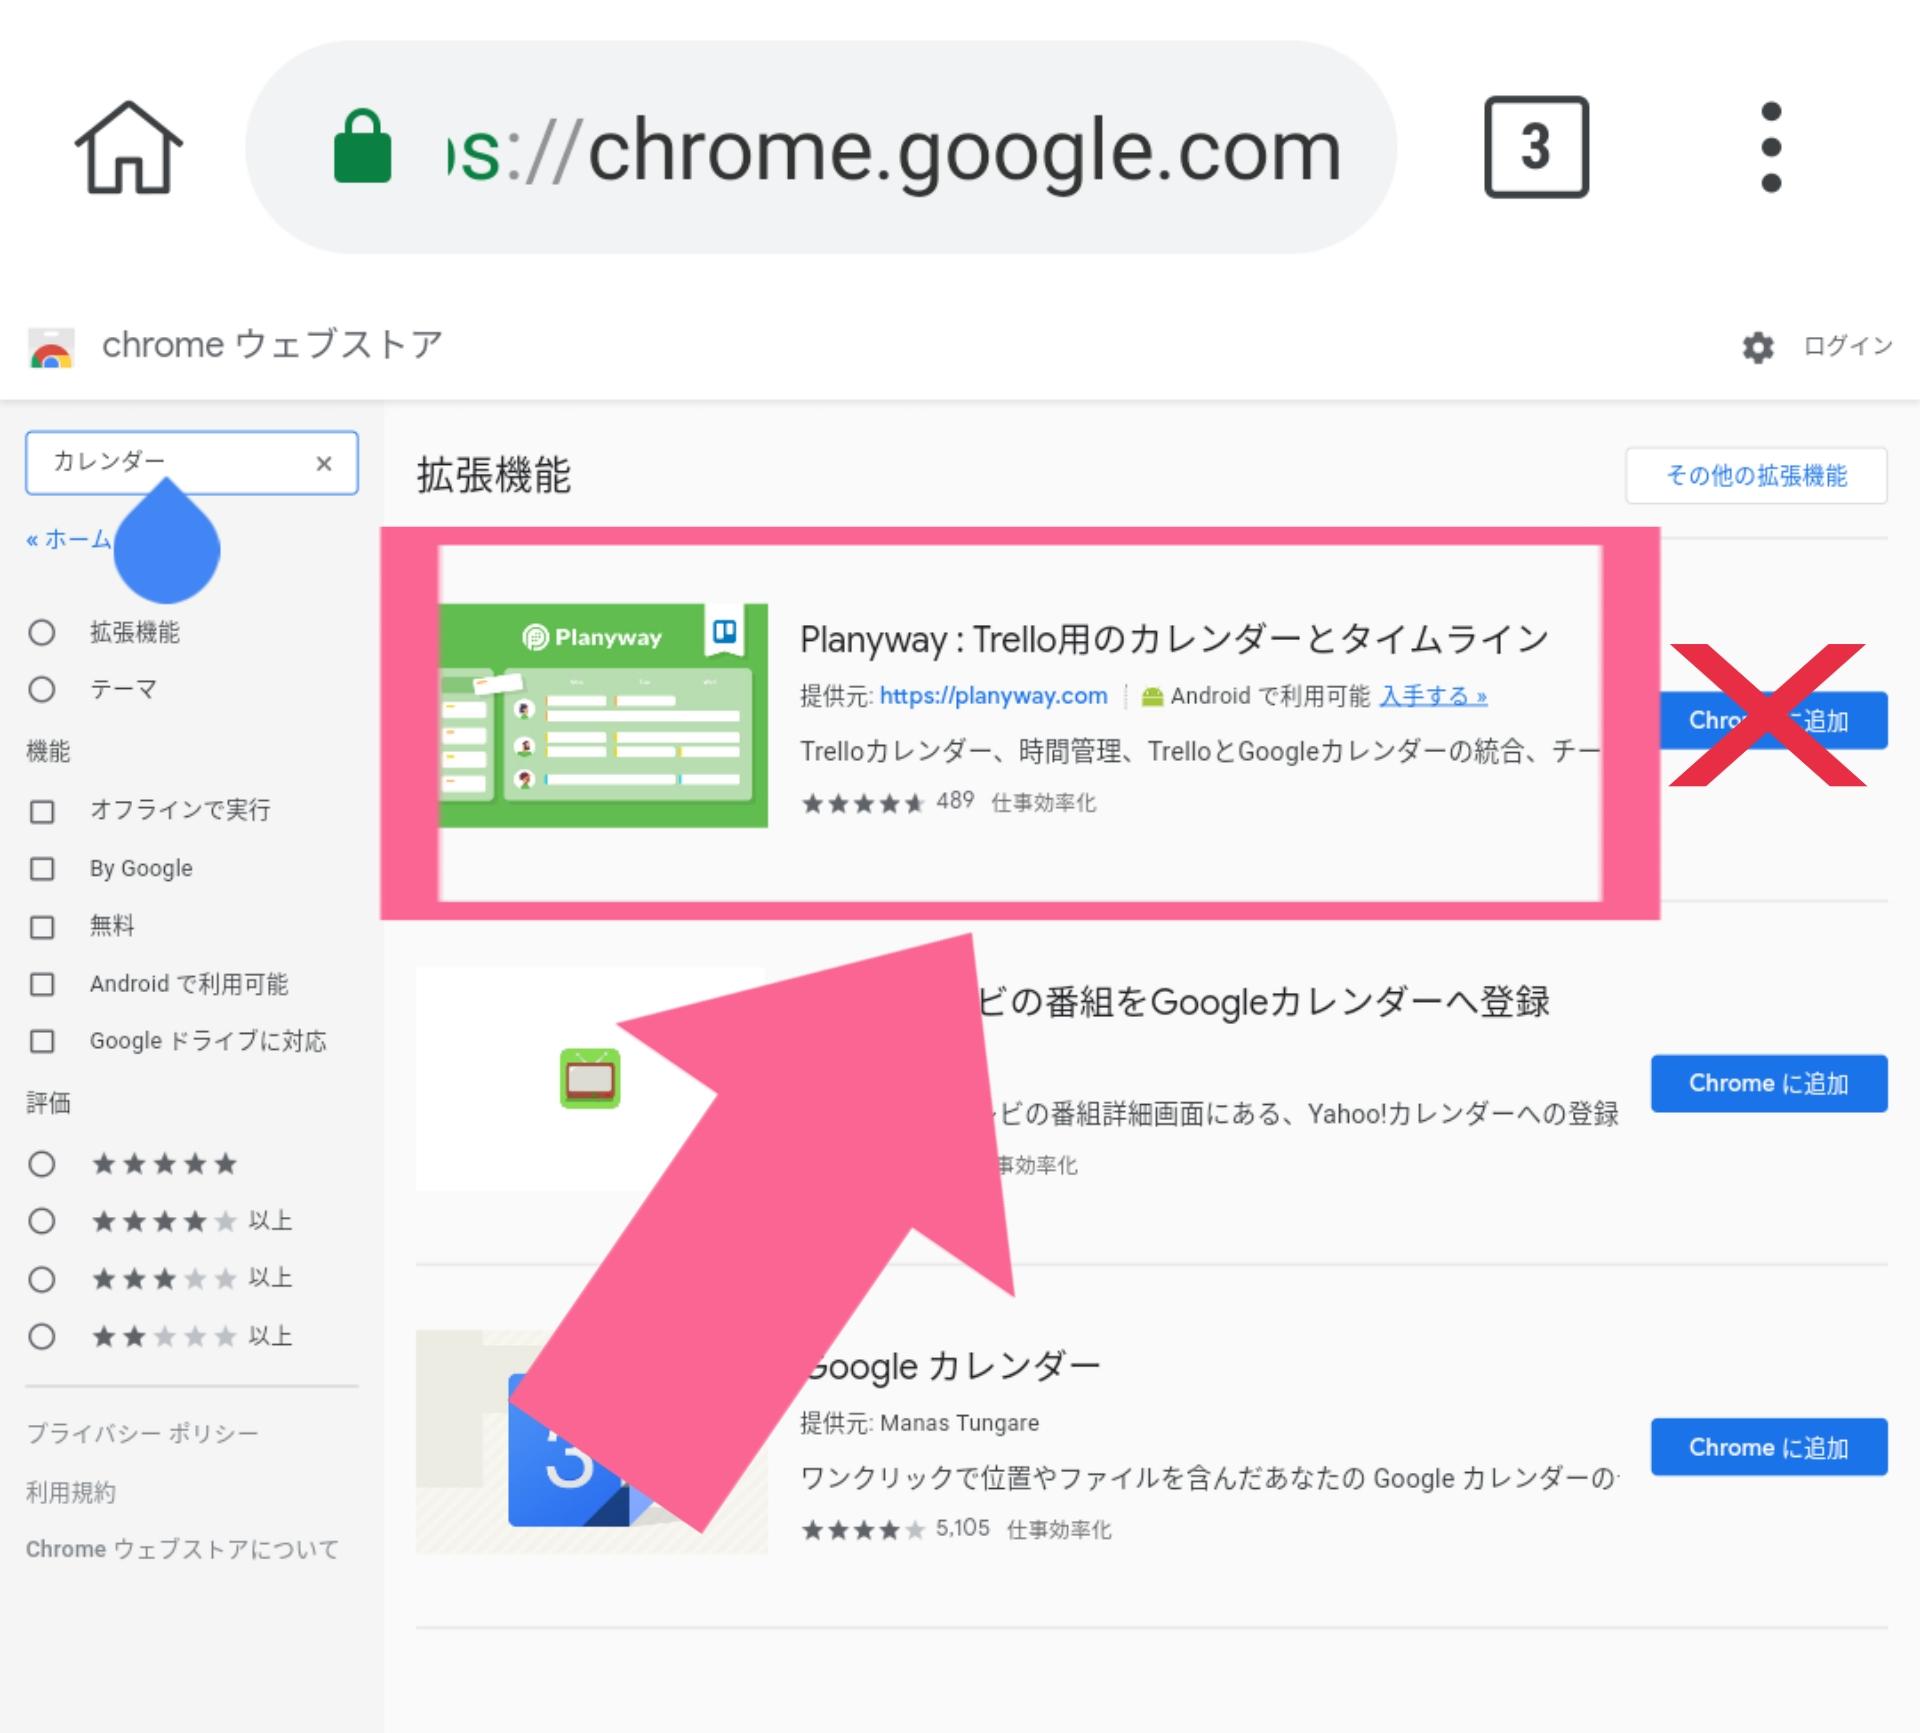 Kiwi Browser Chrome ウェブストア 拡張機能 Chromeに追加以外 タップ 詳細画面 表示